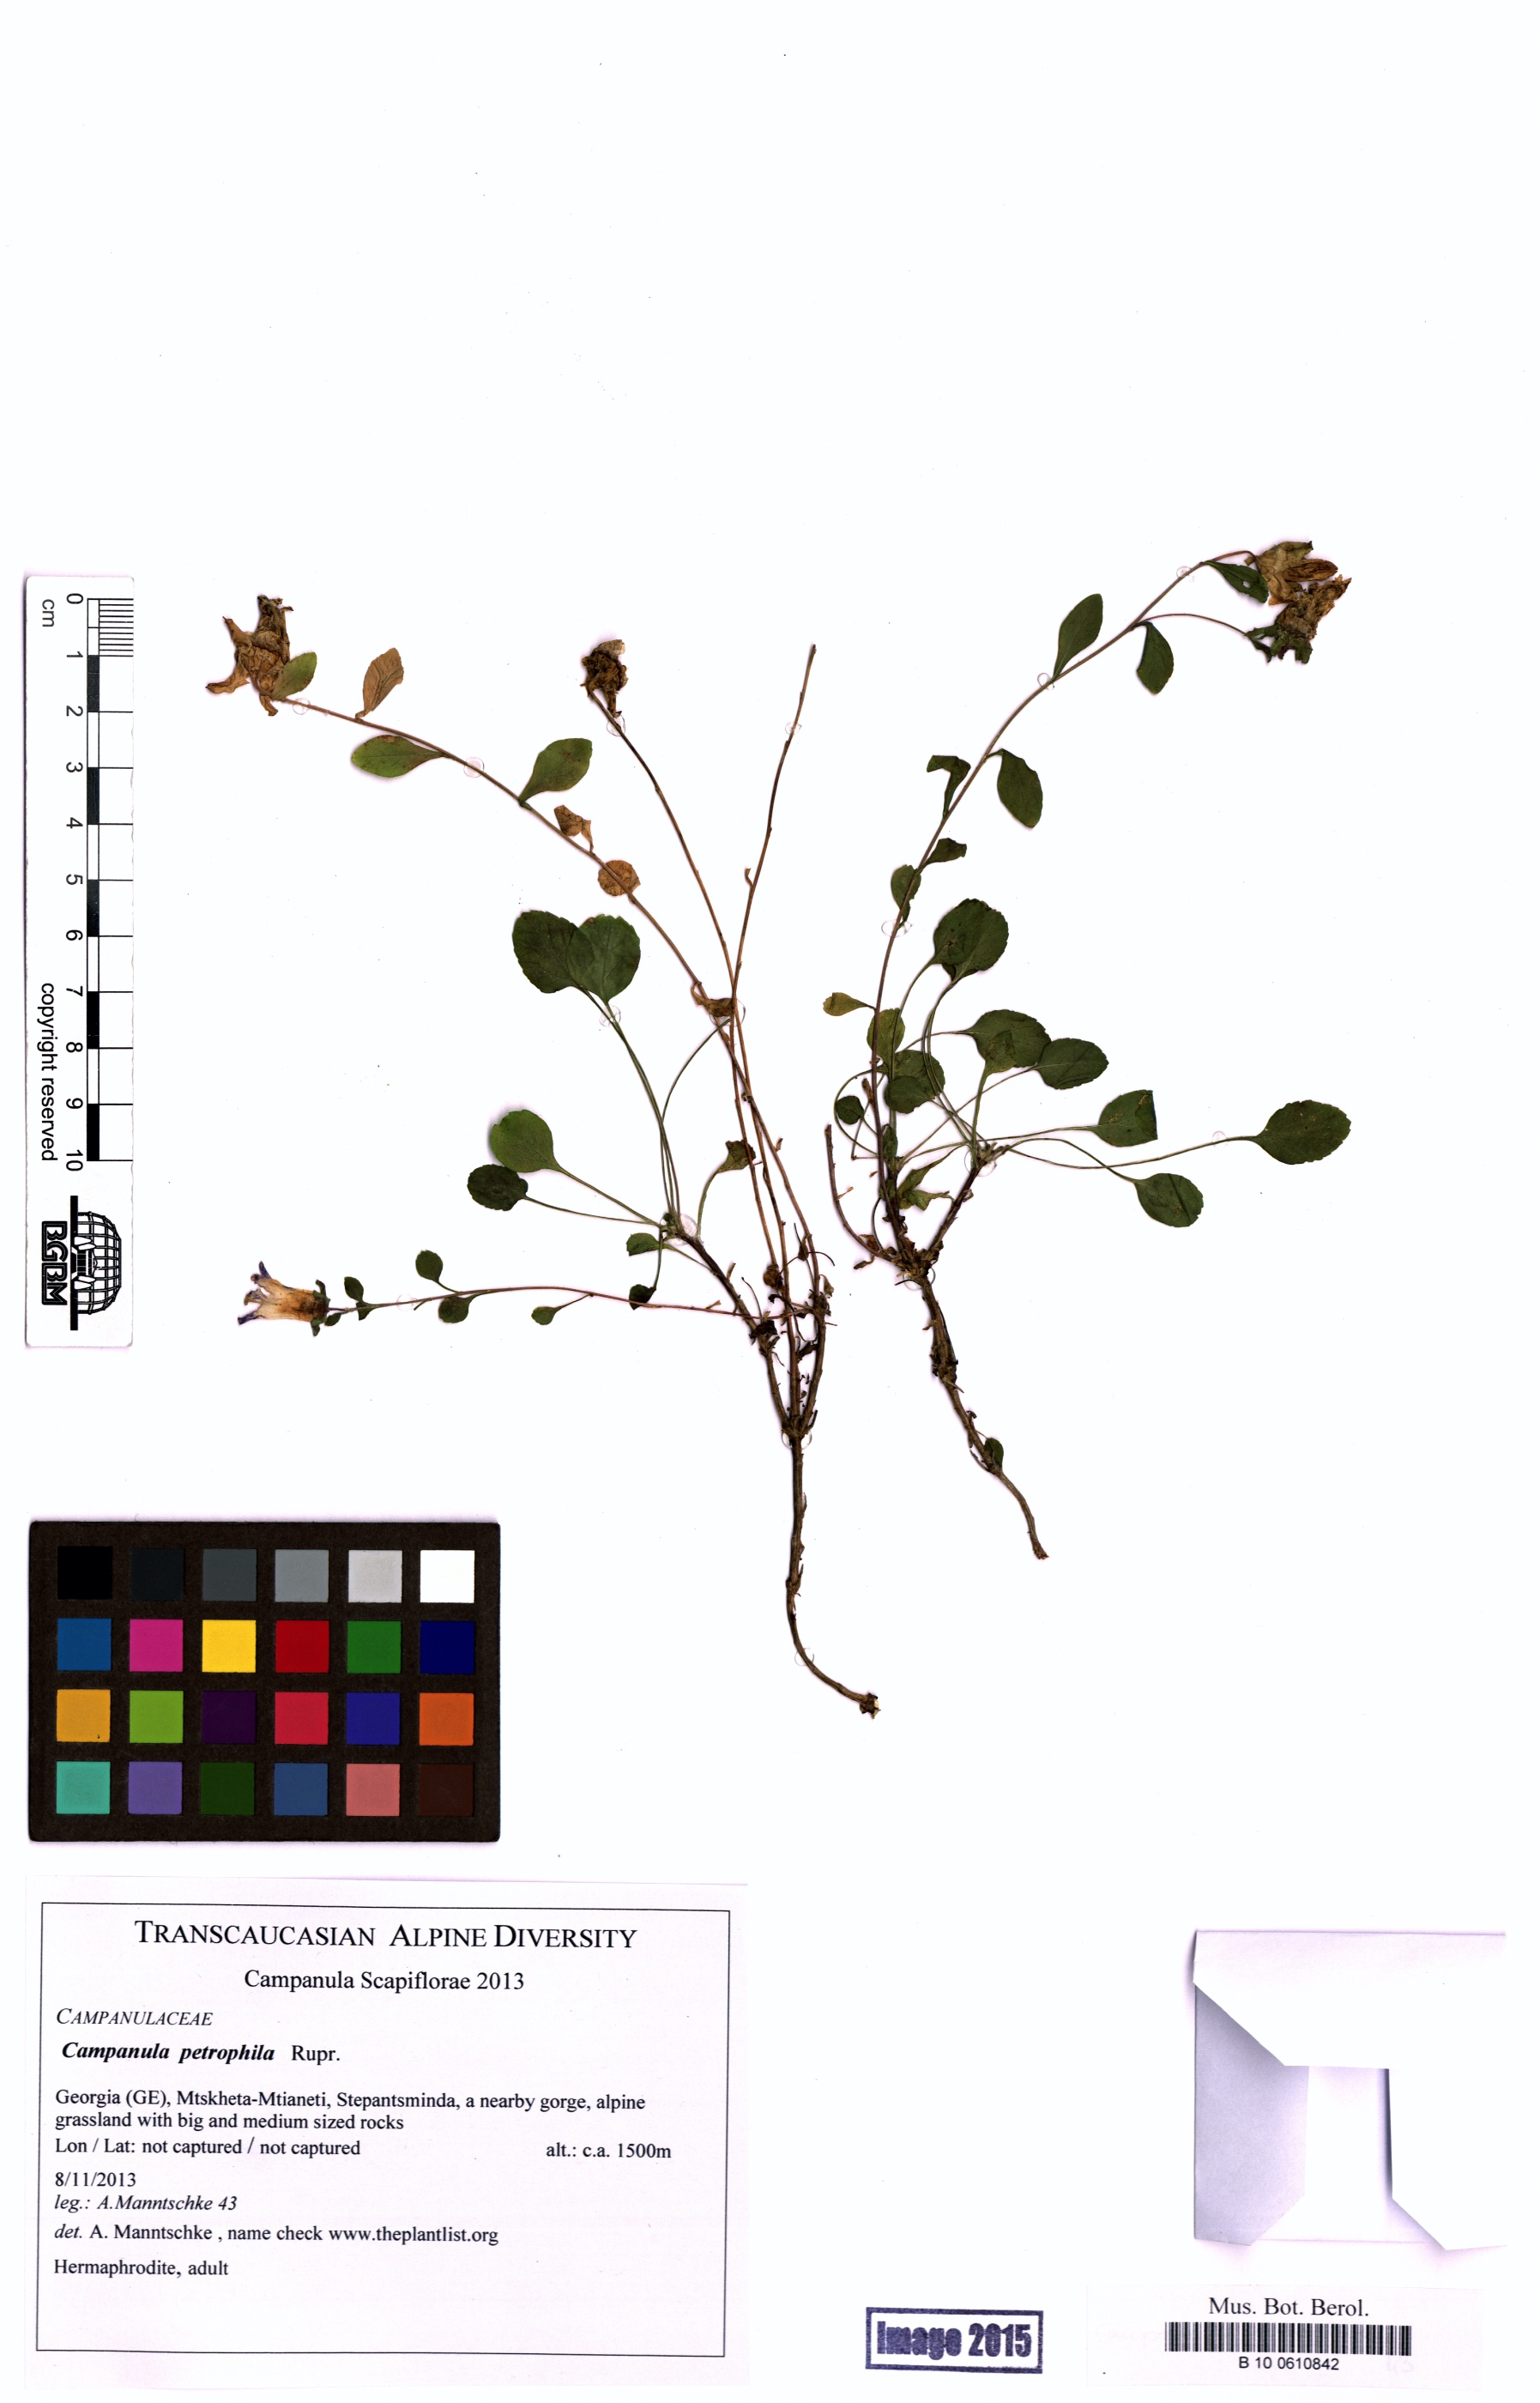 http://ww2.bgbm.org/herbarium/images/B/10/06/10/84/B_10_0610842.jpg